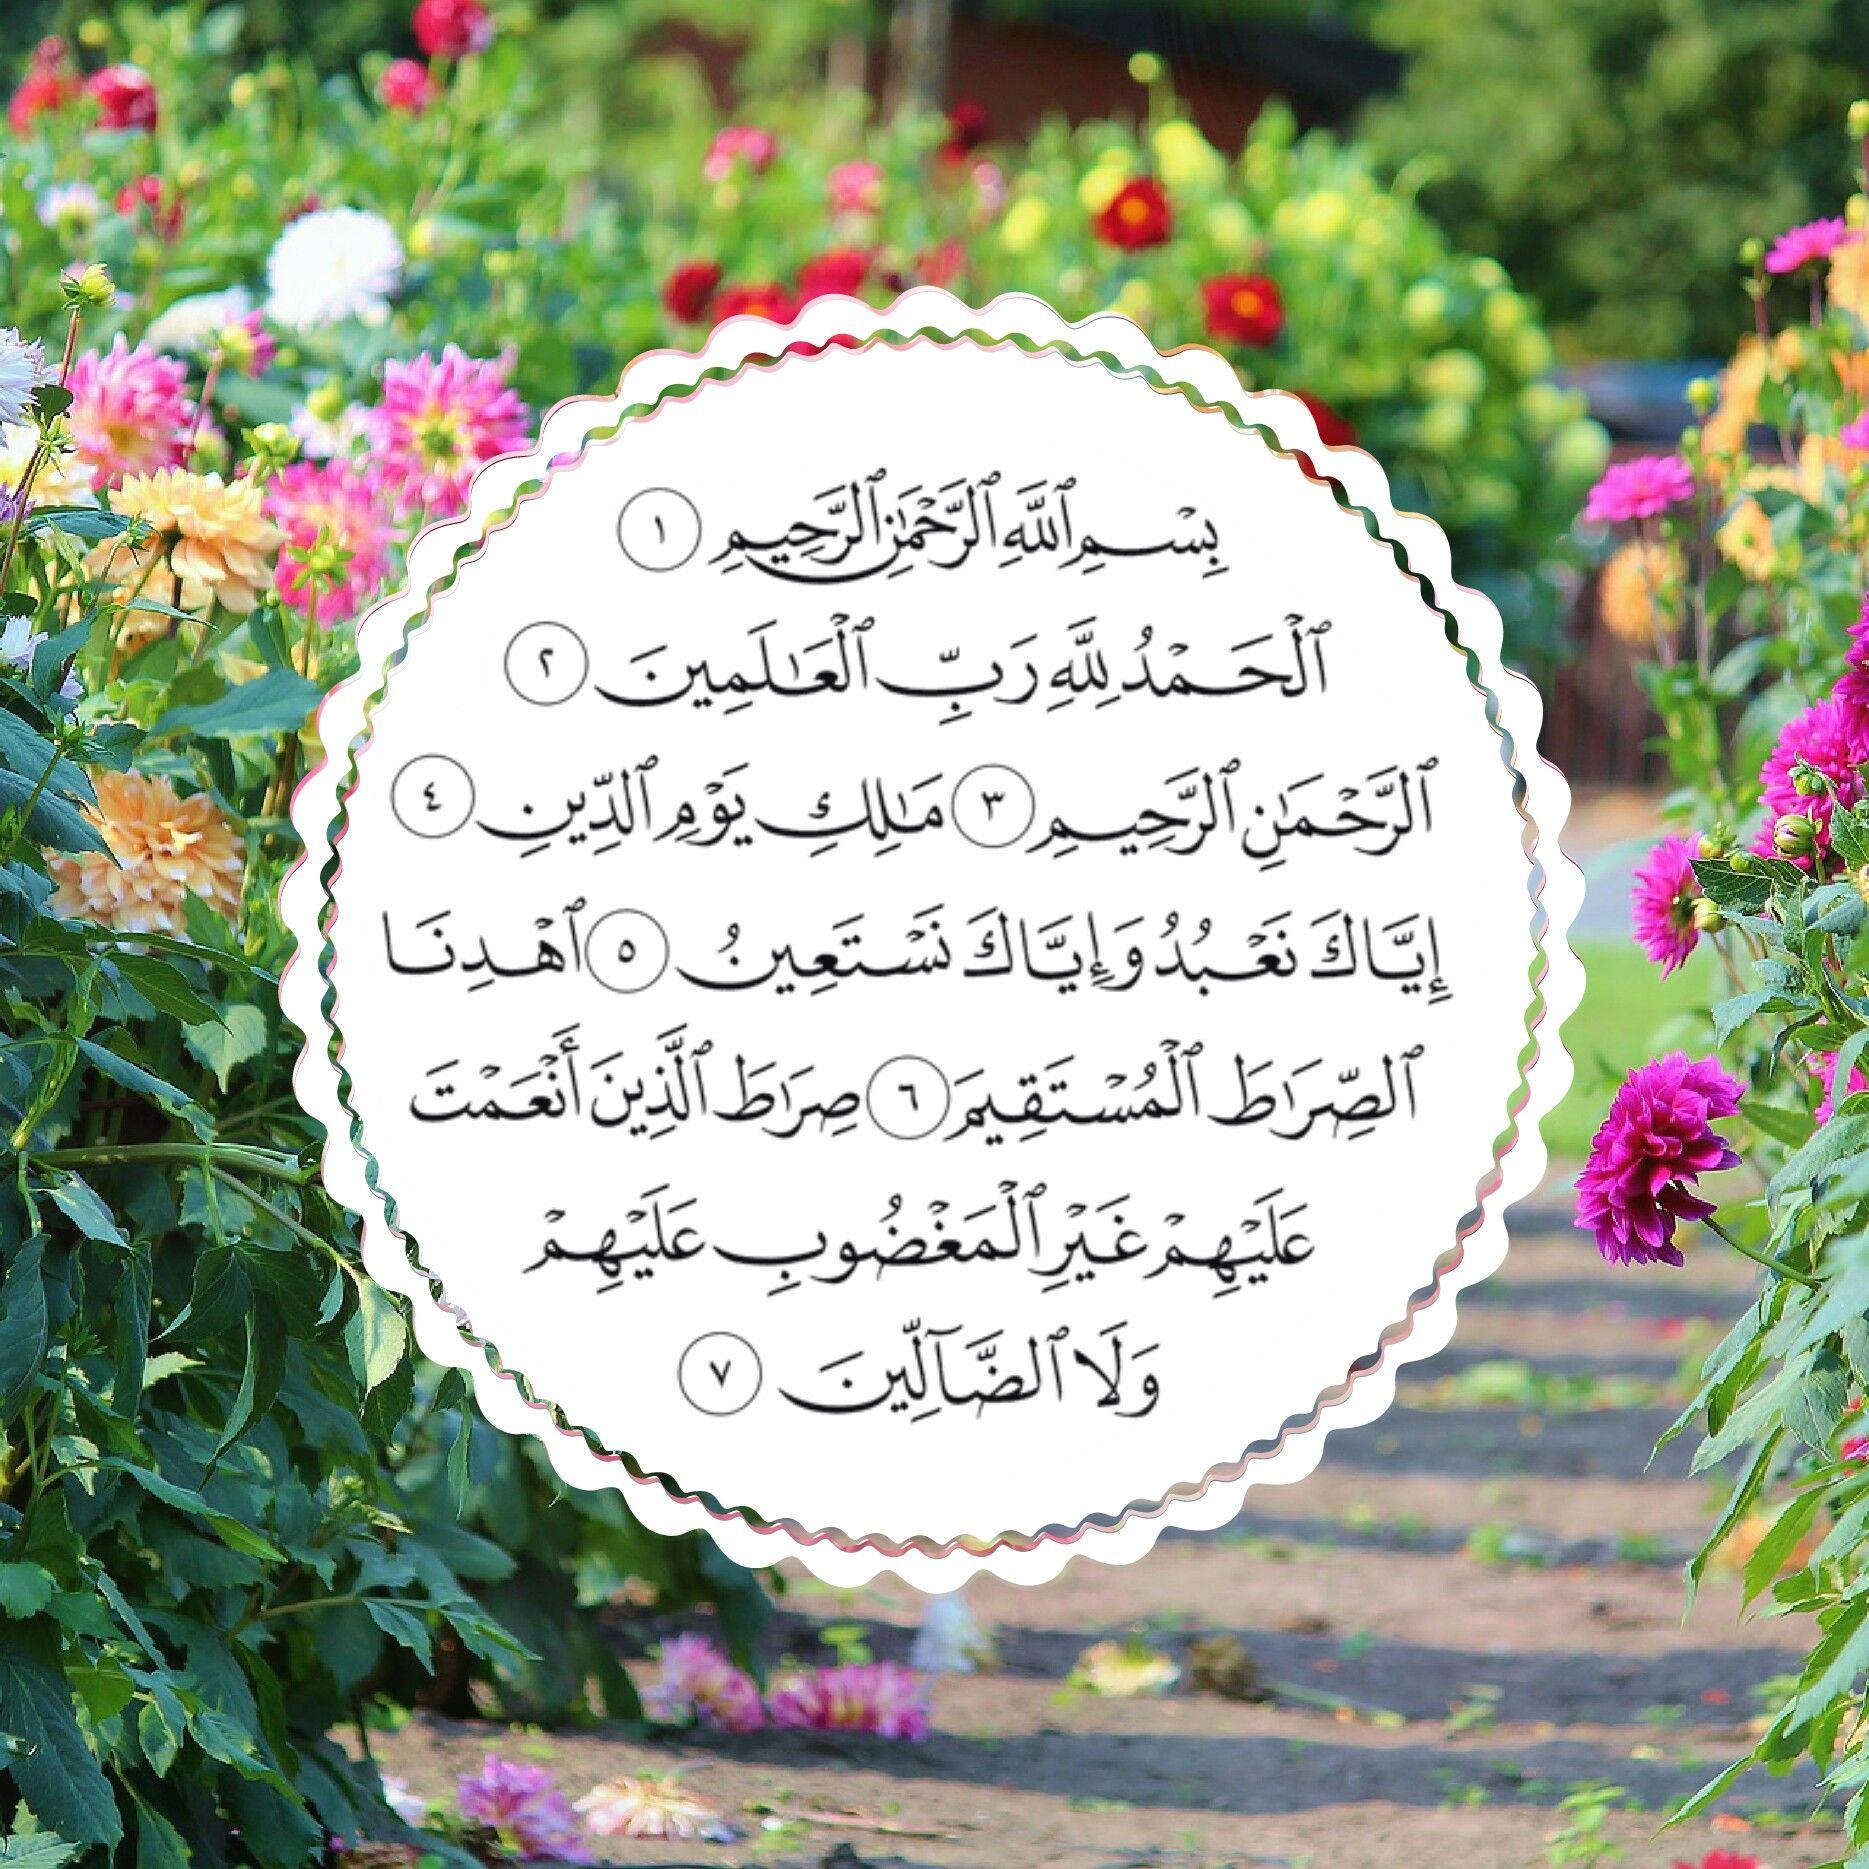 سورة الفاتحة Ramadan Images Beautiful Quran Verses Surah Fatiha